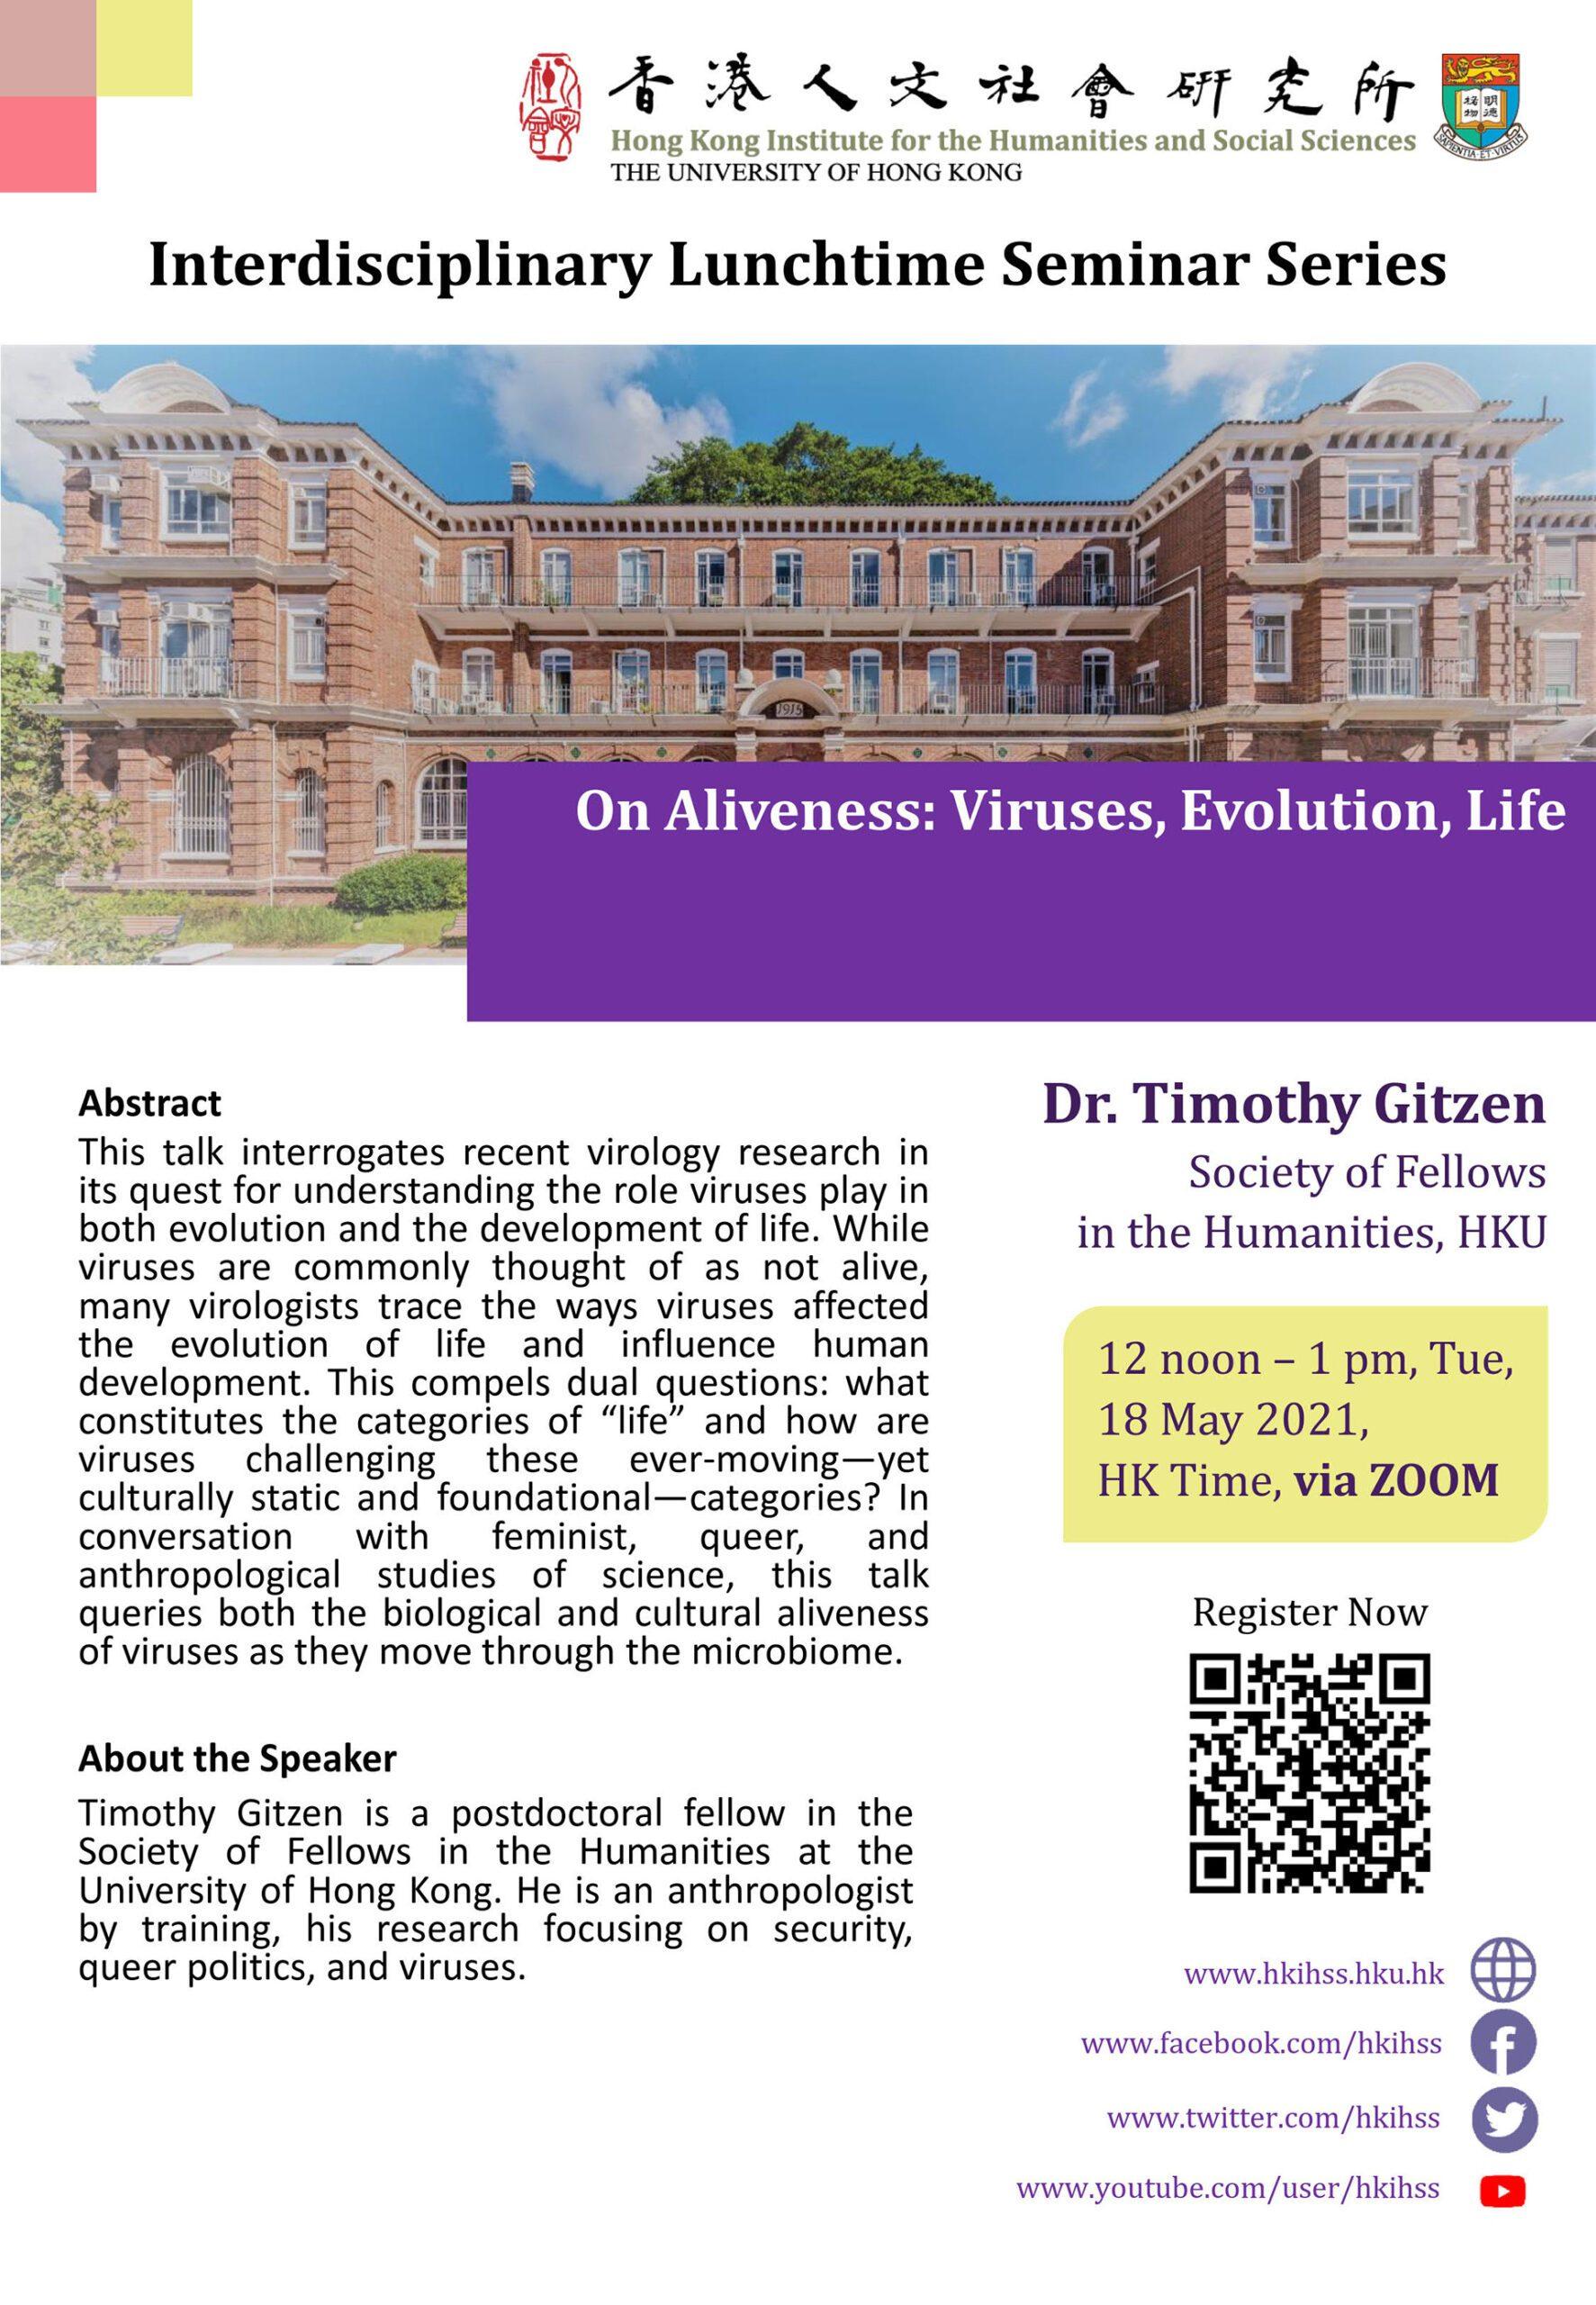 "Interdisciplinary Lunchtime Seminar on ""On Aliveness: Viruses, Evolution, Life"" by Dr. Timothy Gitzen (May 18, 2021)"